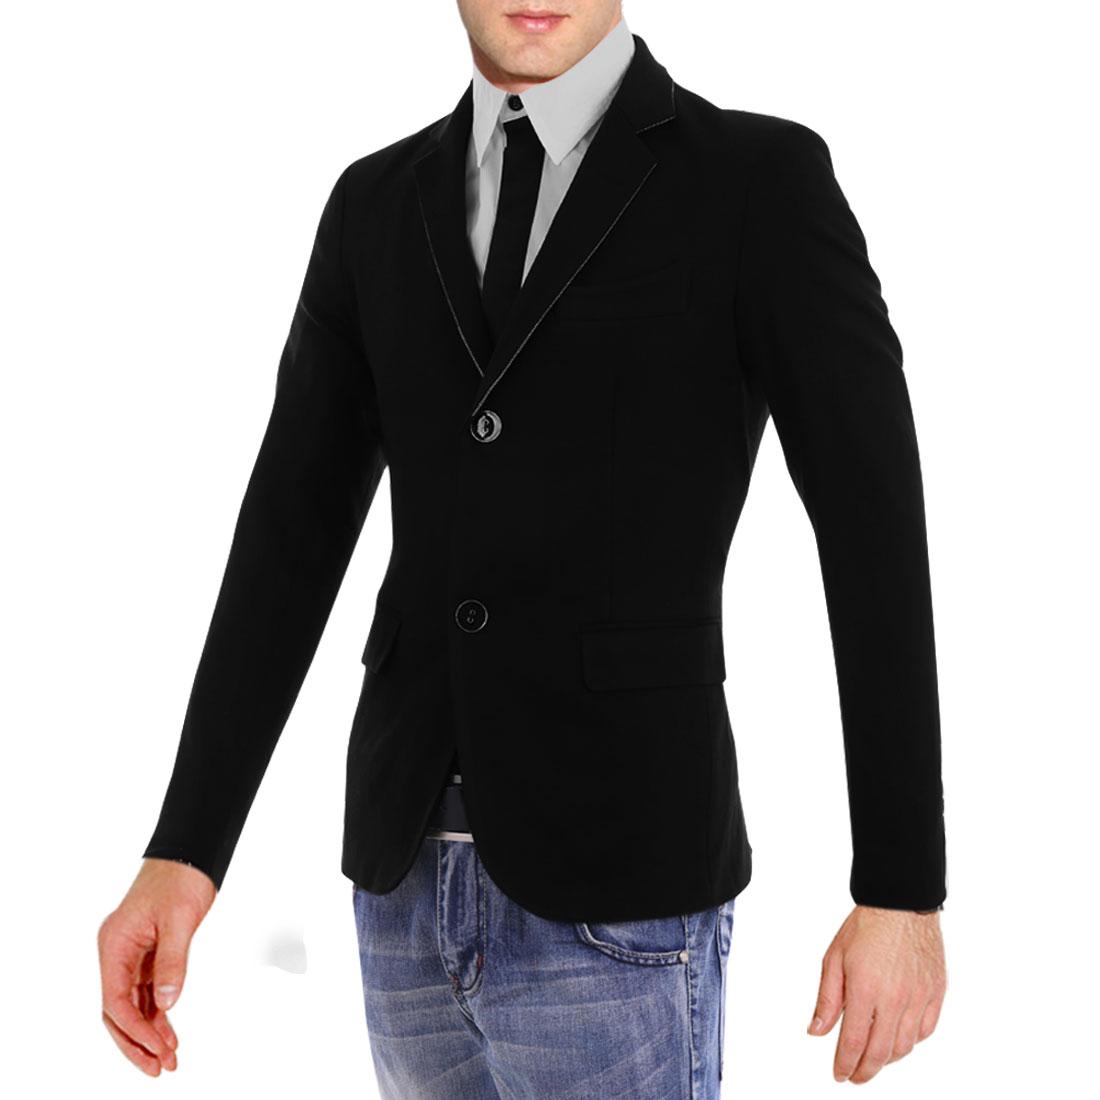 Men M Black Long Sleeve Design Stand Collar Chest Pocket Slim Fit Blazer